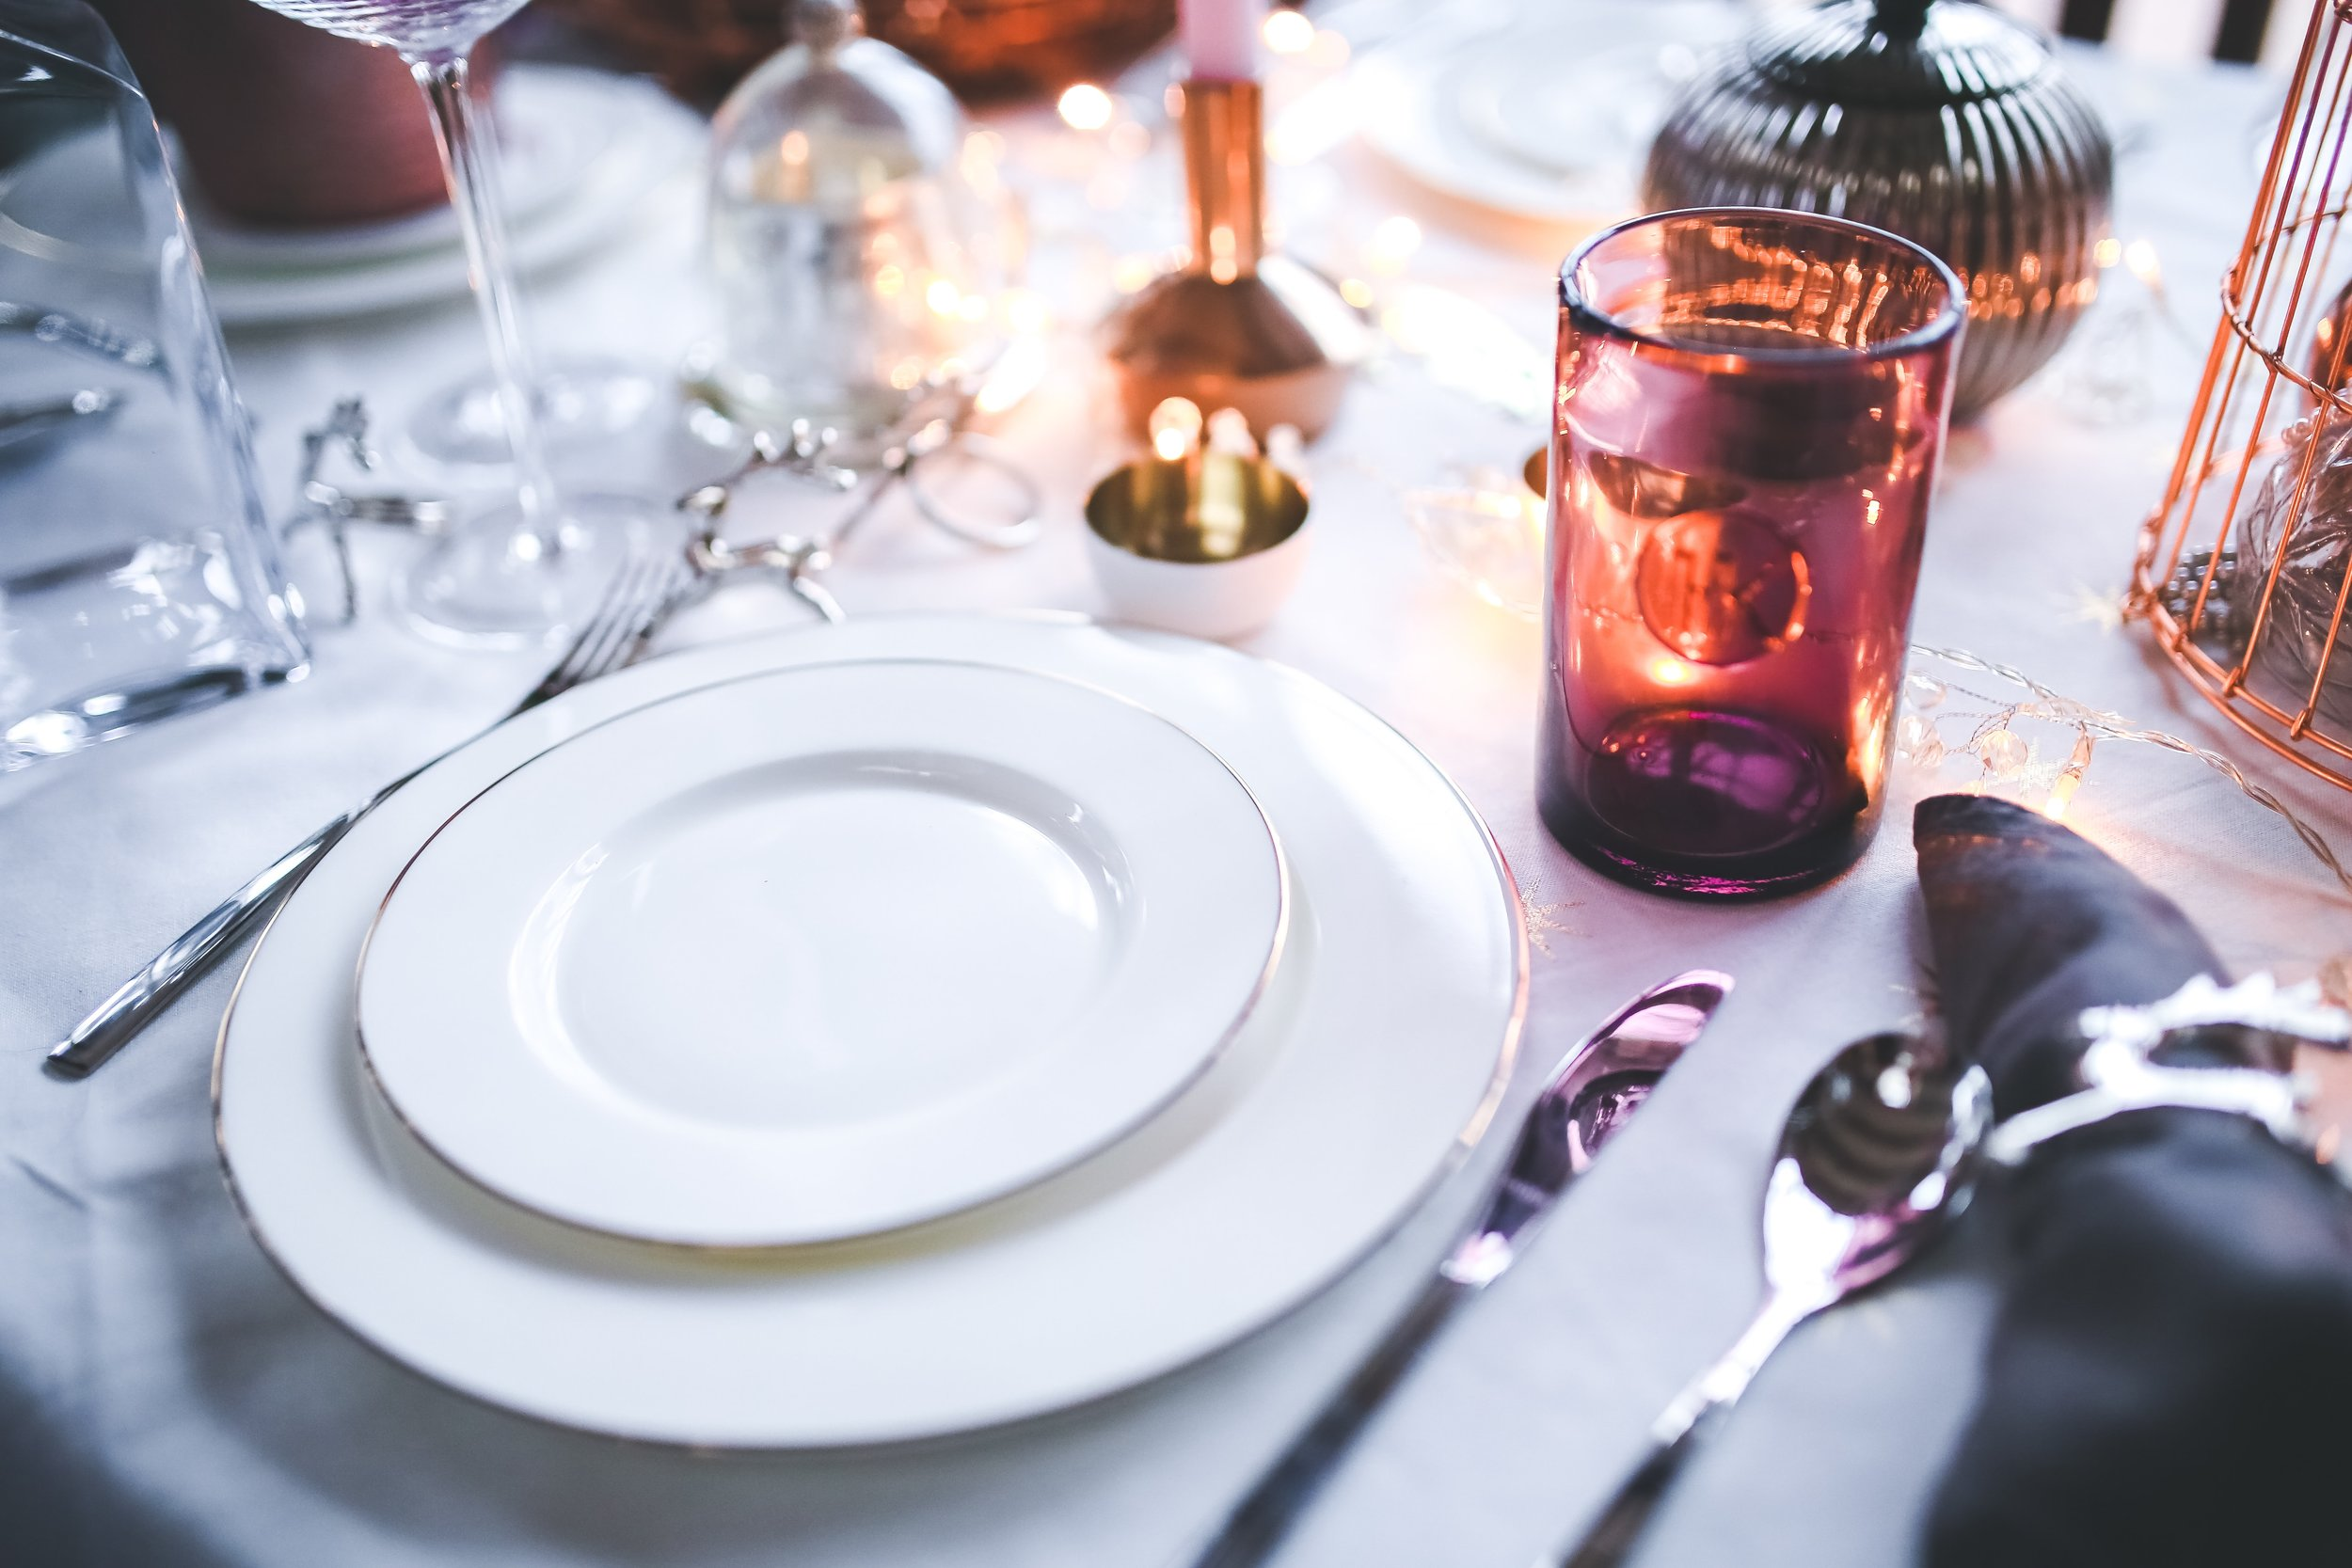 christmas-cutlery-dinner-6305.jpg